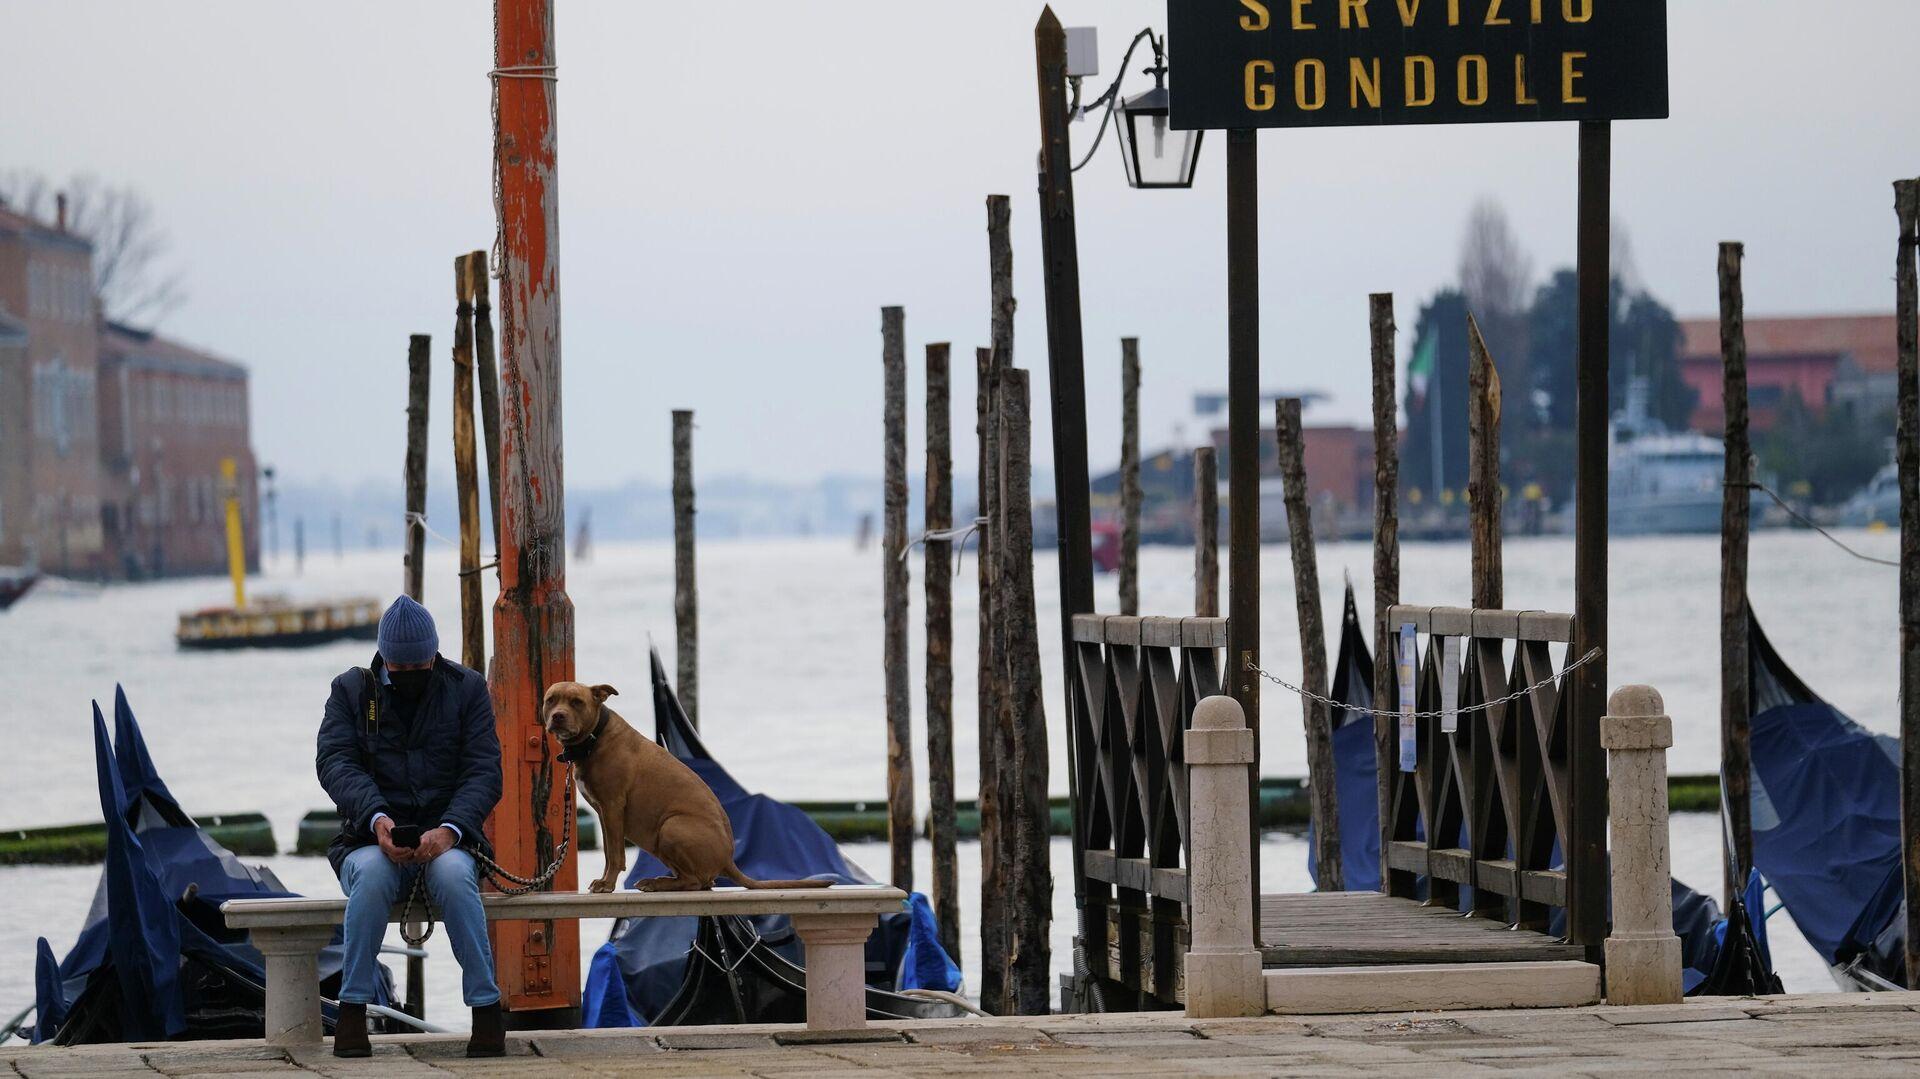 Venecia durante el brote de coronavirus en Italia - Sputnik Mundo, 1920, 25.03.2021